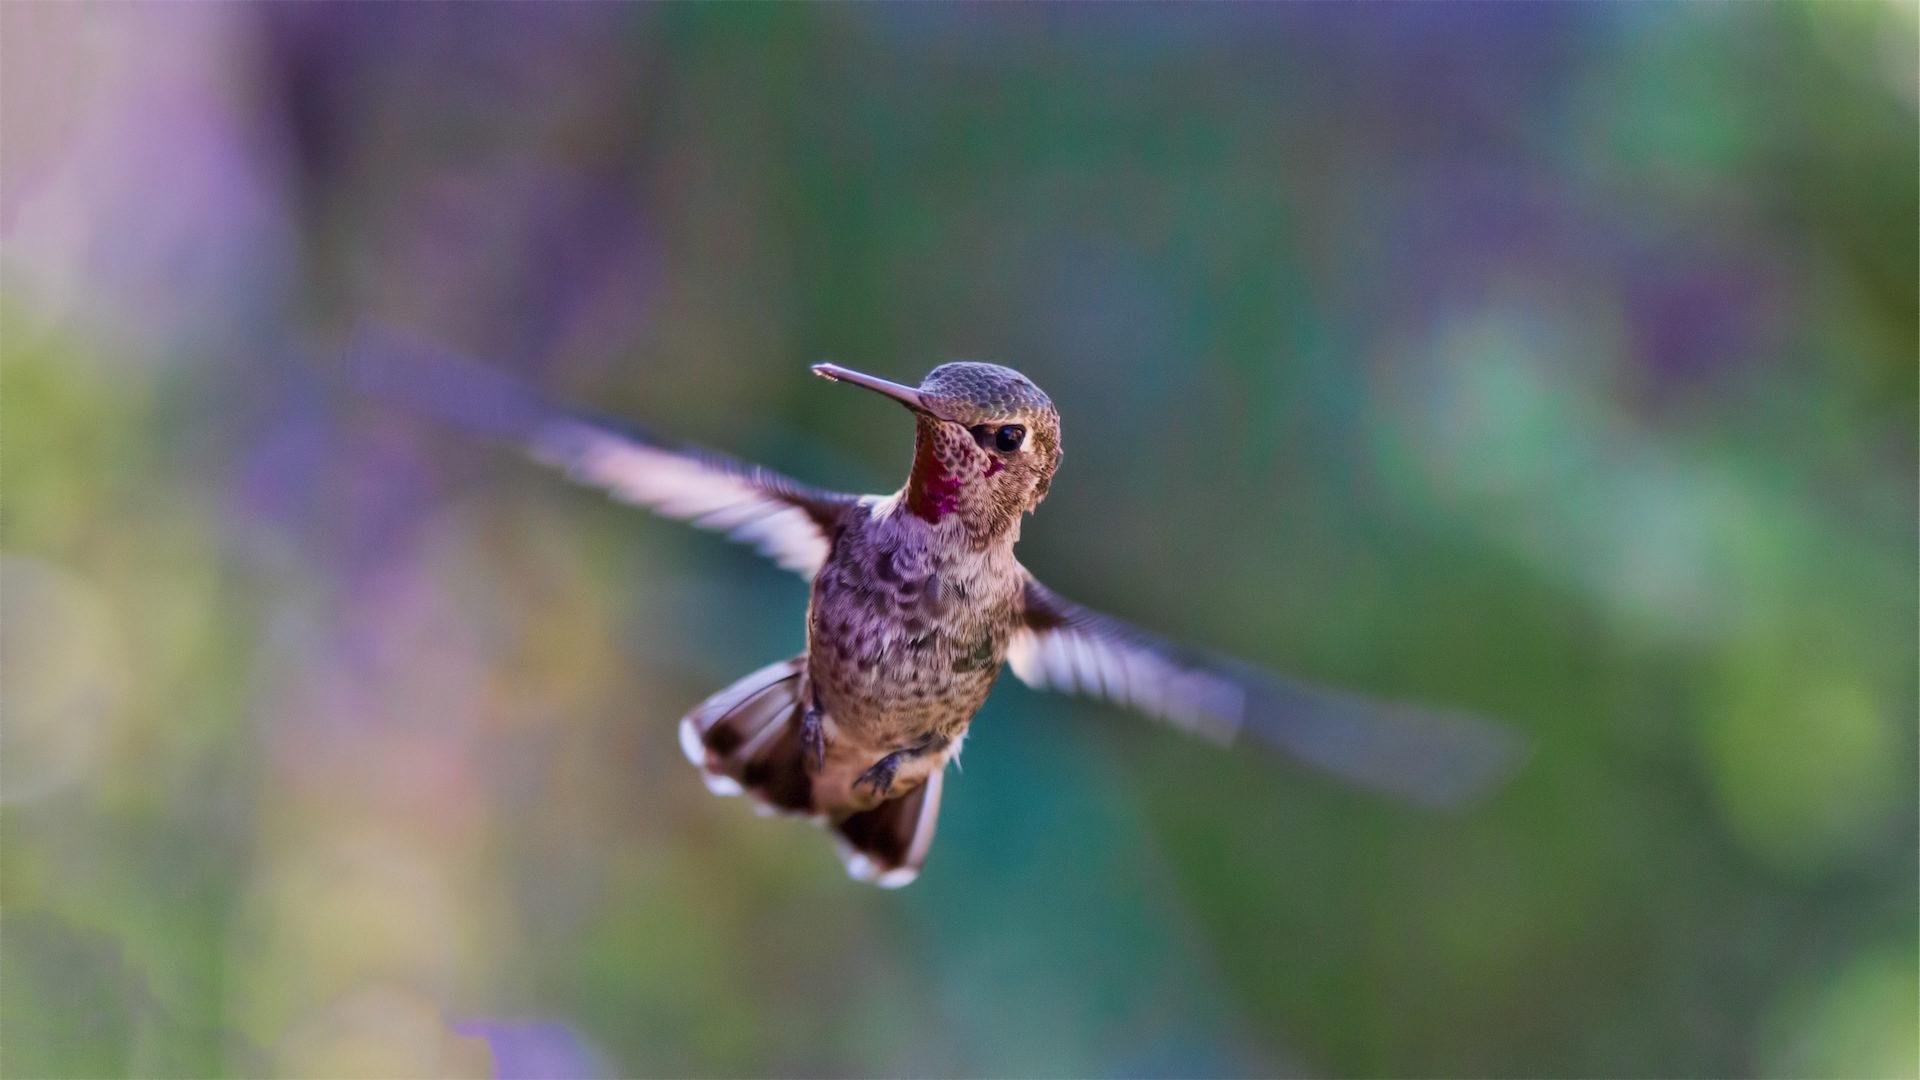 colibrí, alas, pájaro, volar, aleteo - Fondos de Pantalla HD - professor-falken.com